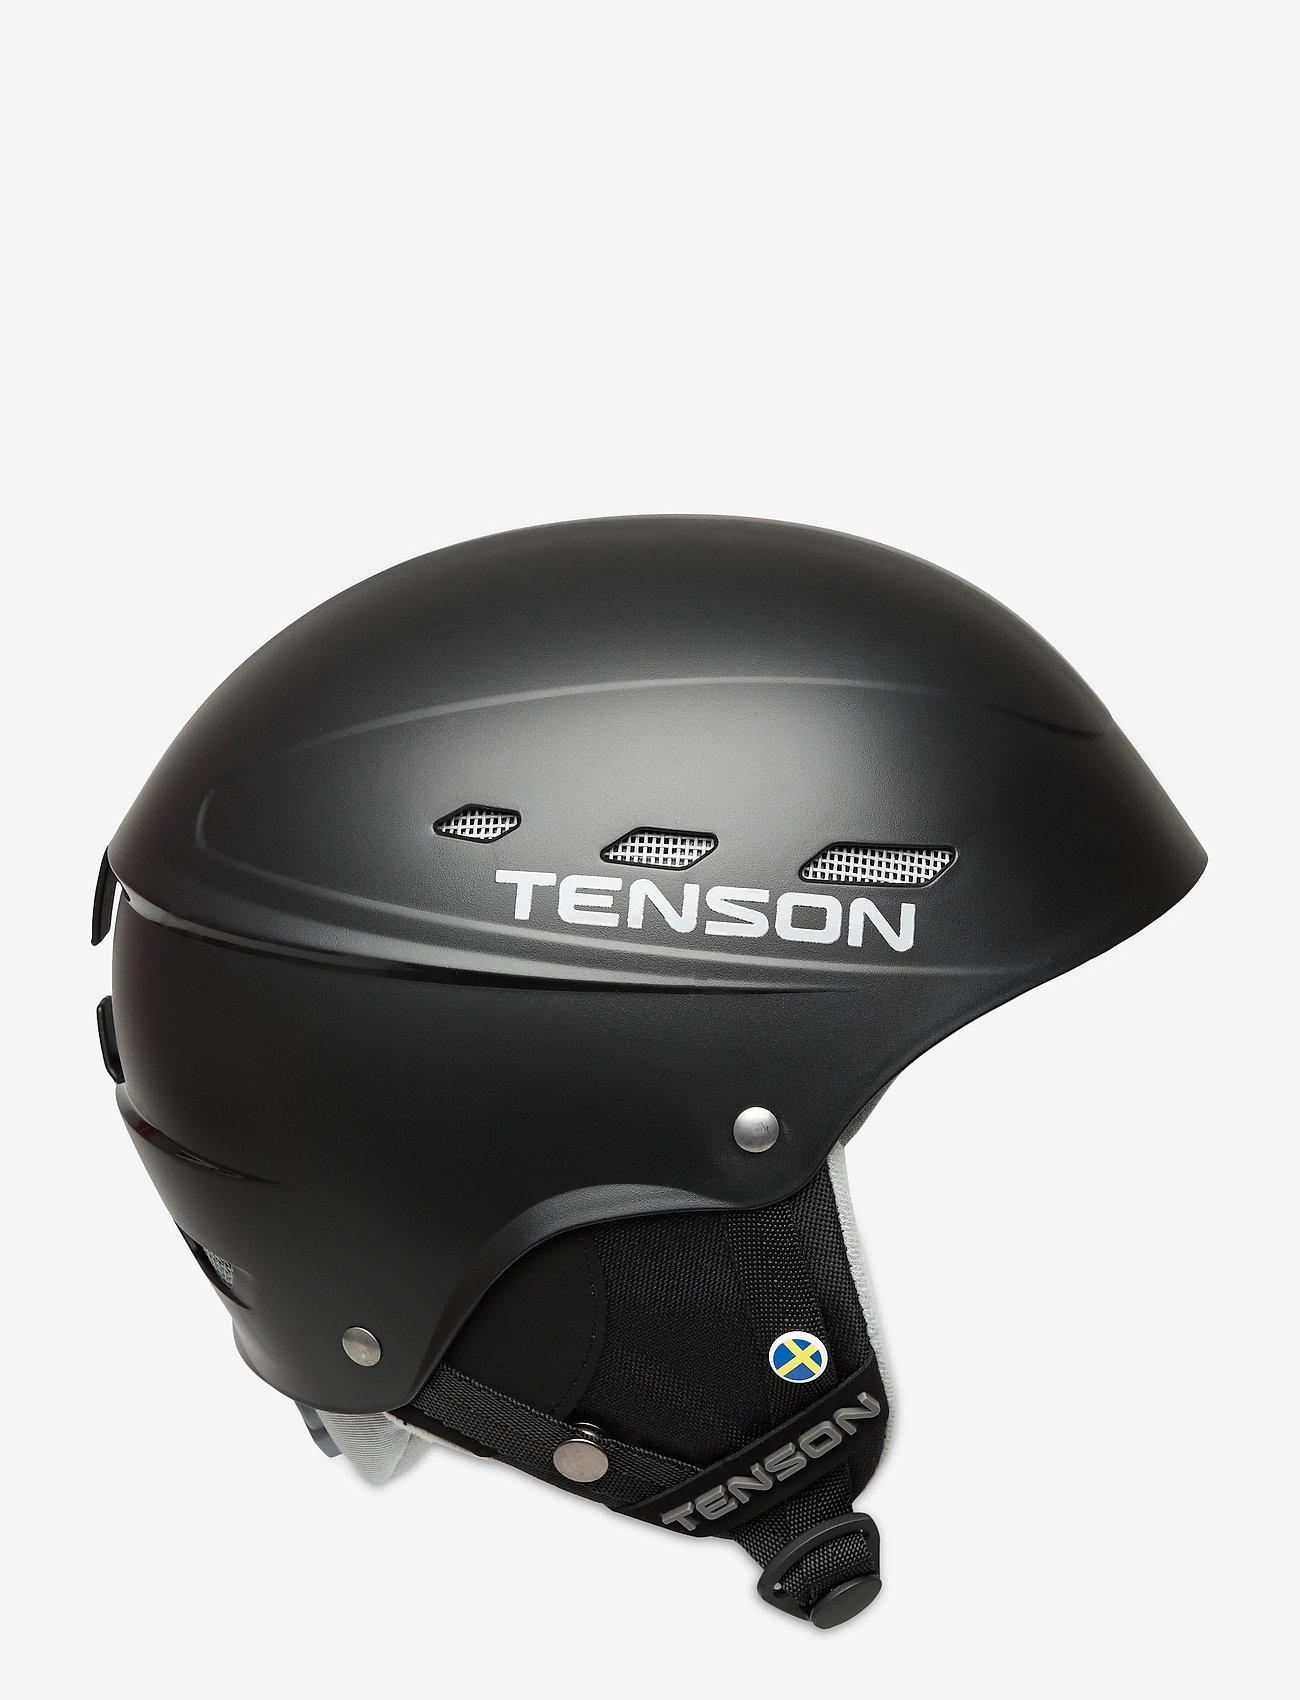 Tenson - CORE - wintersportuitrusting - black - 1